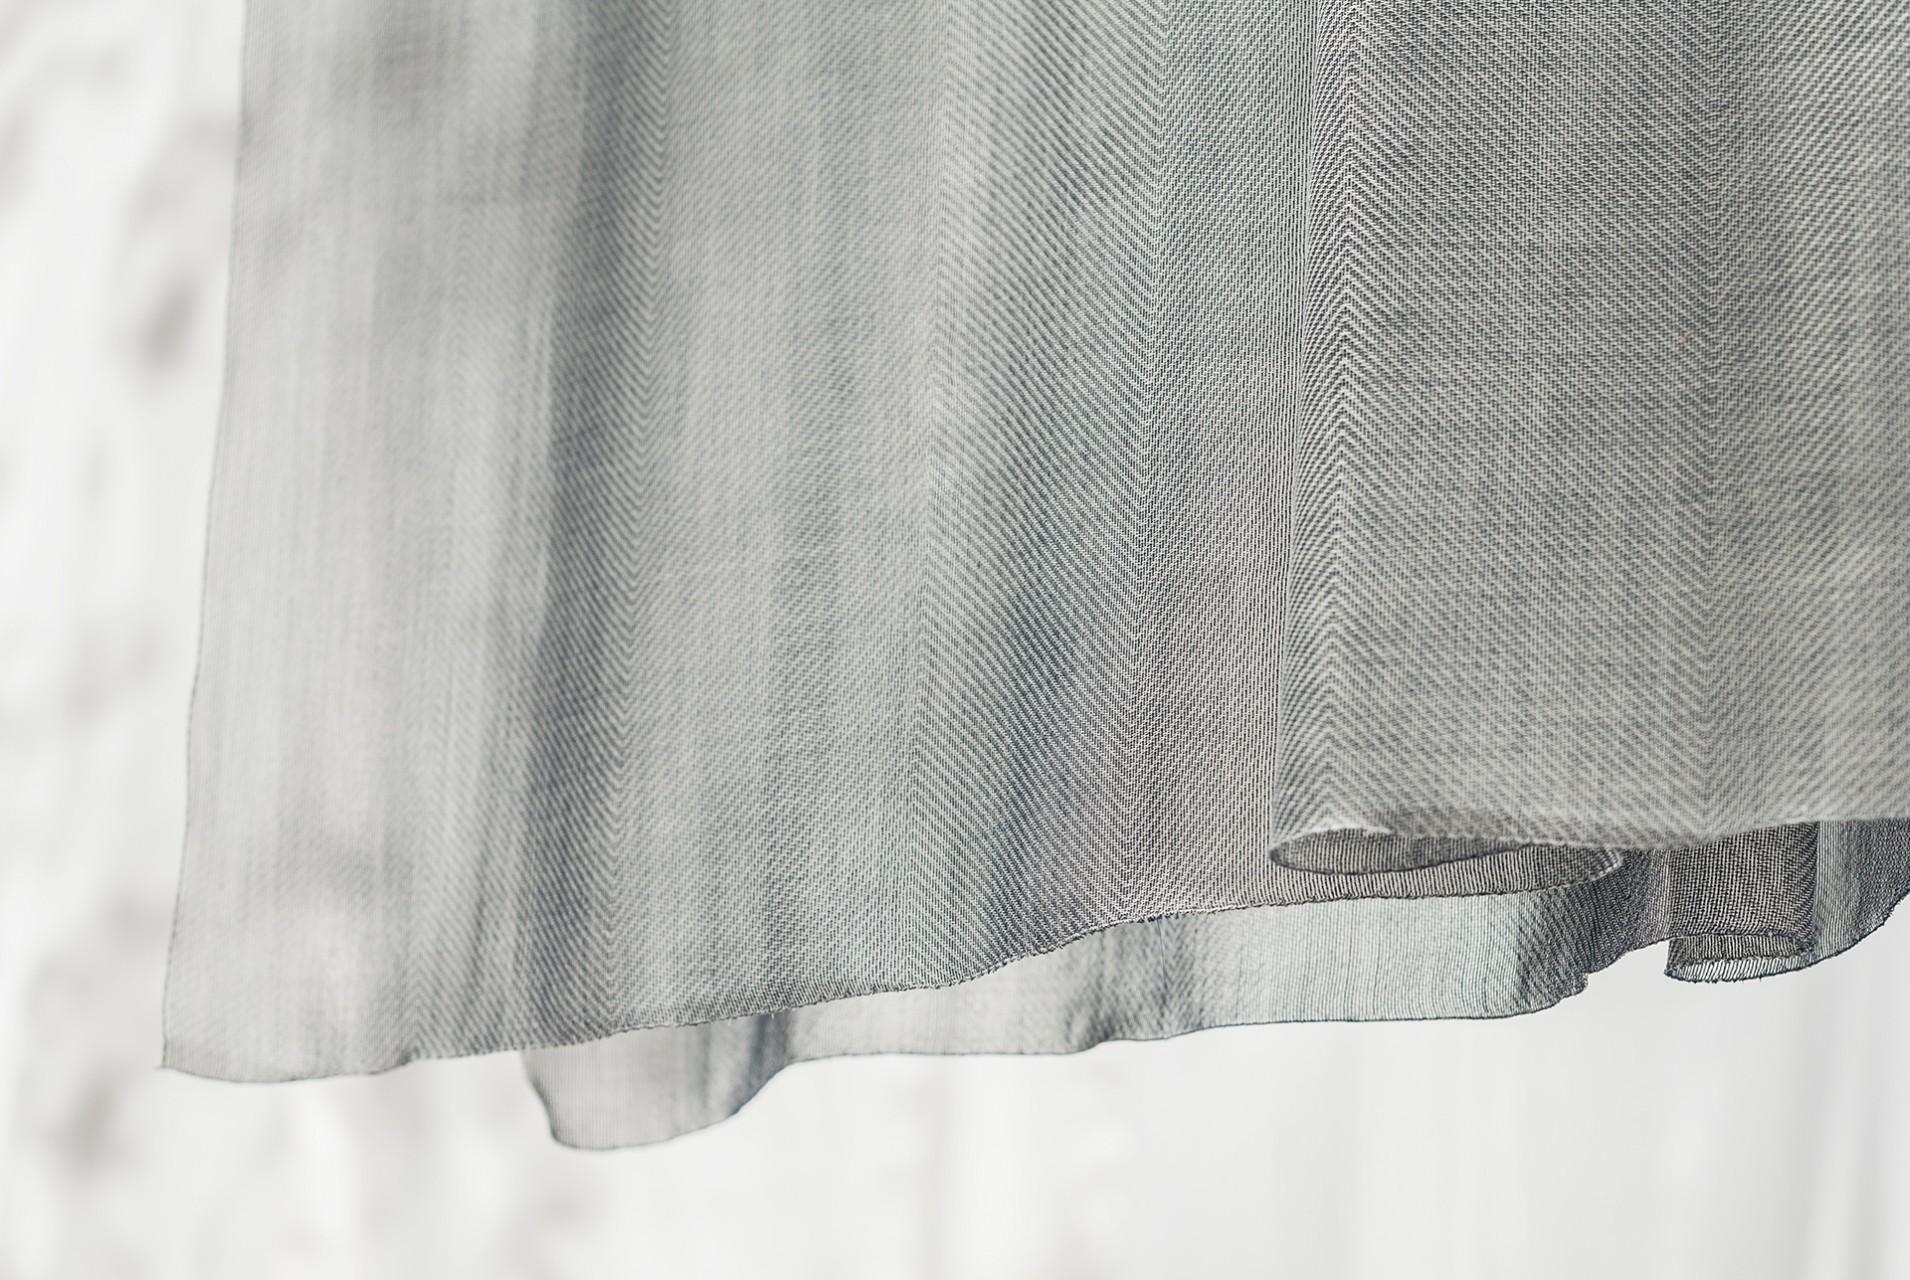 kinnasand | biennale interieur kortrijk 2016